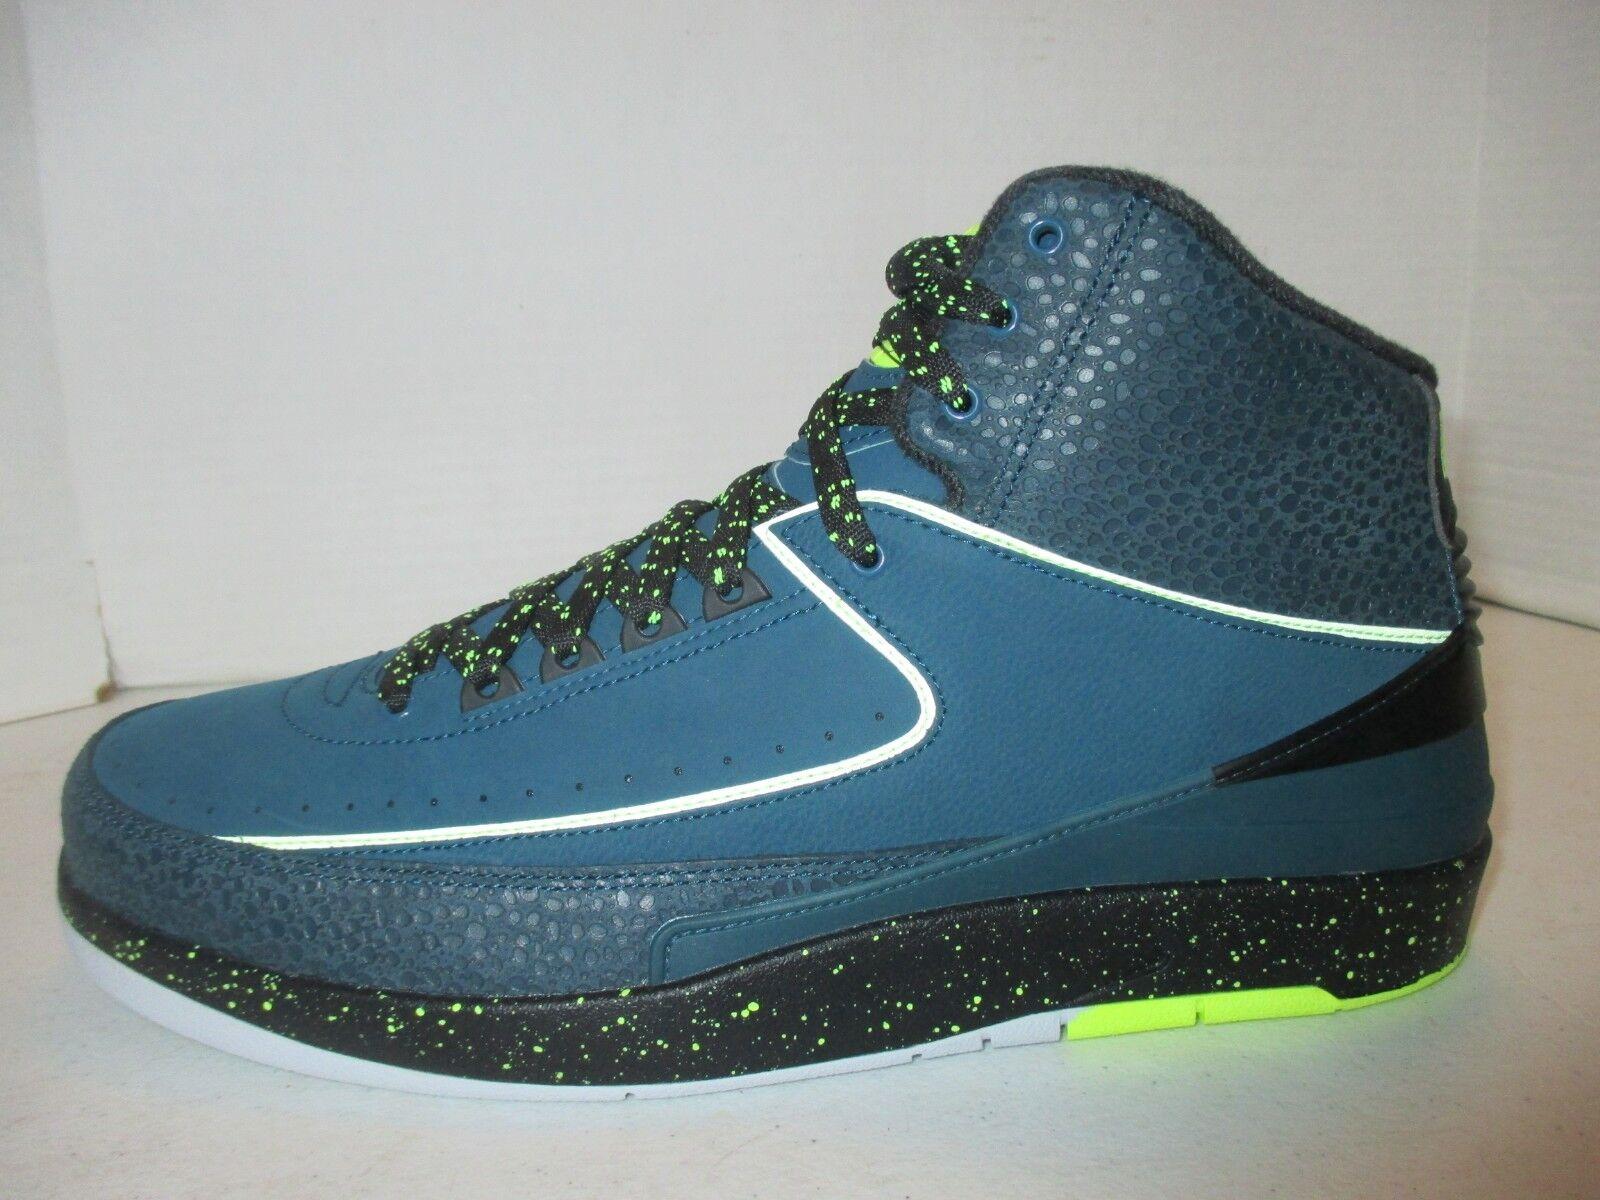 best sneakers 9f8f4 42631 Nike Air Jordan 2 II Retro Nightshade Size Size Size 14....385475